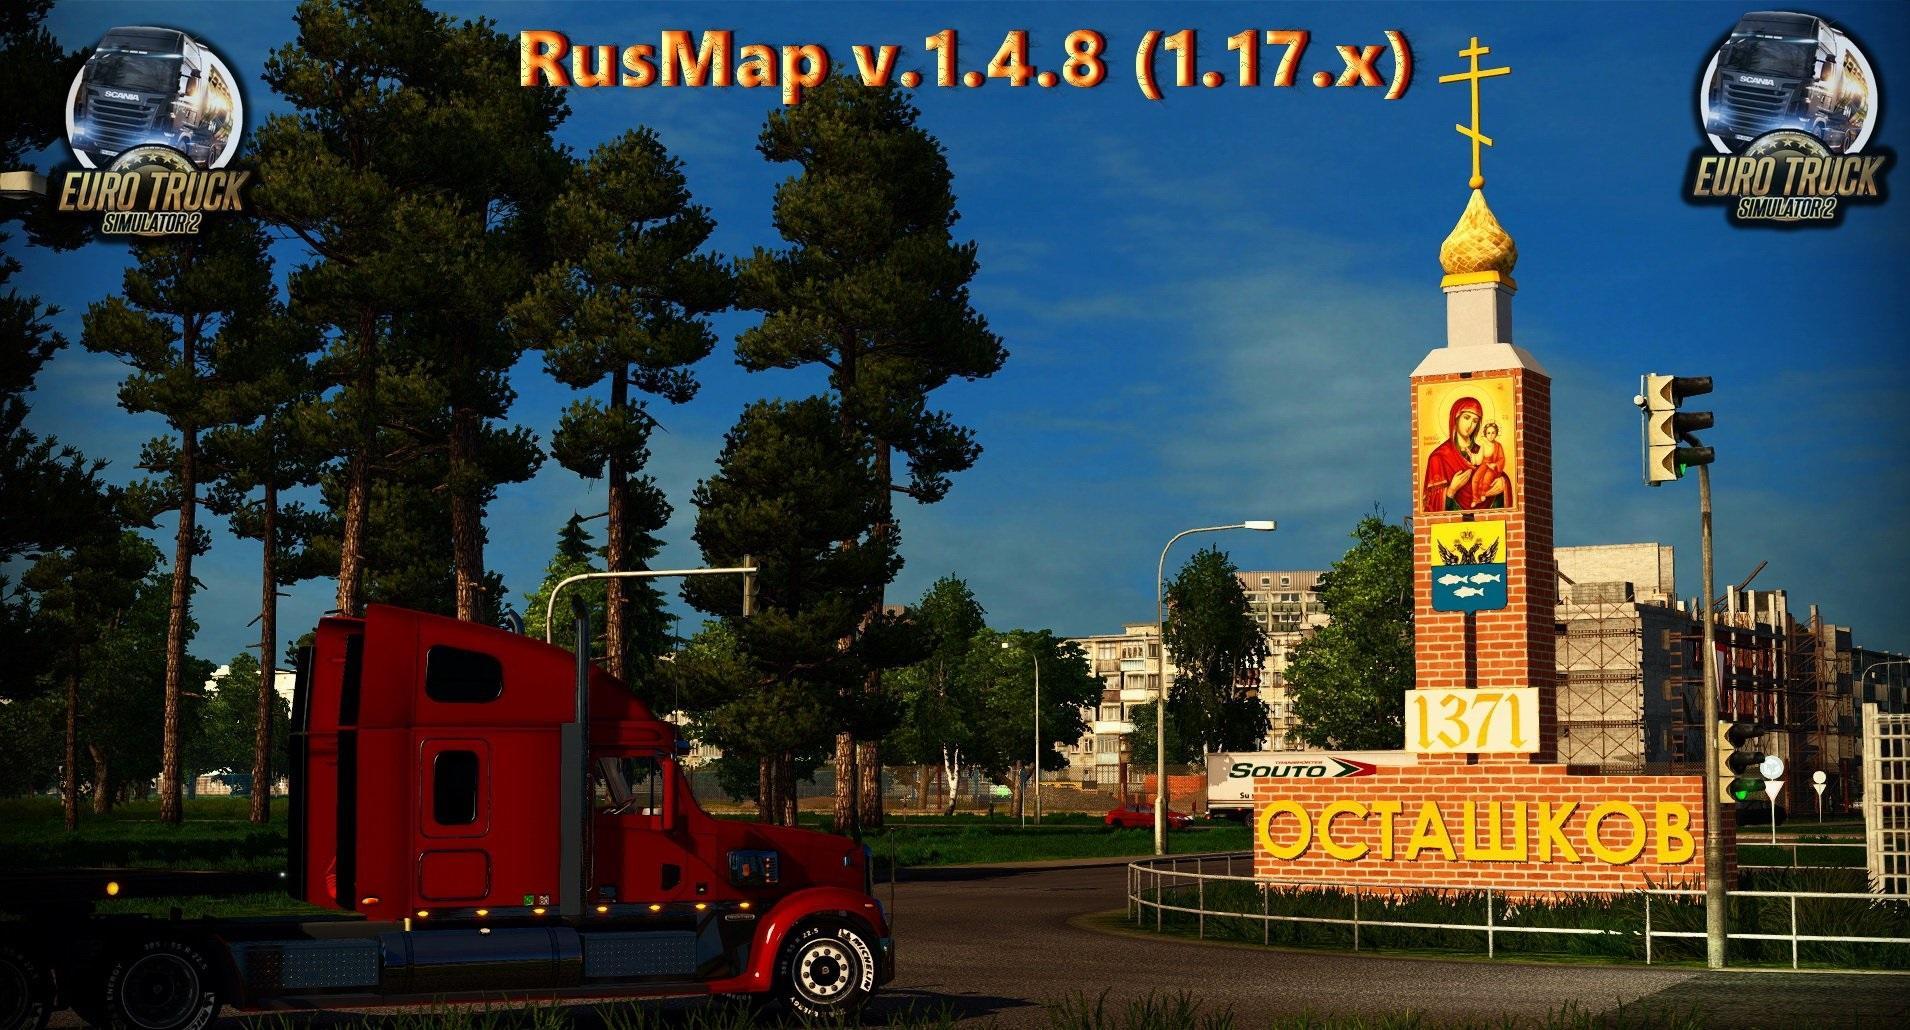 rusmap-v1-4-8-1-17-x-by-aldimtor_4